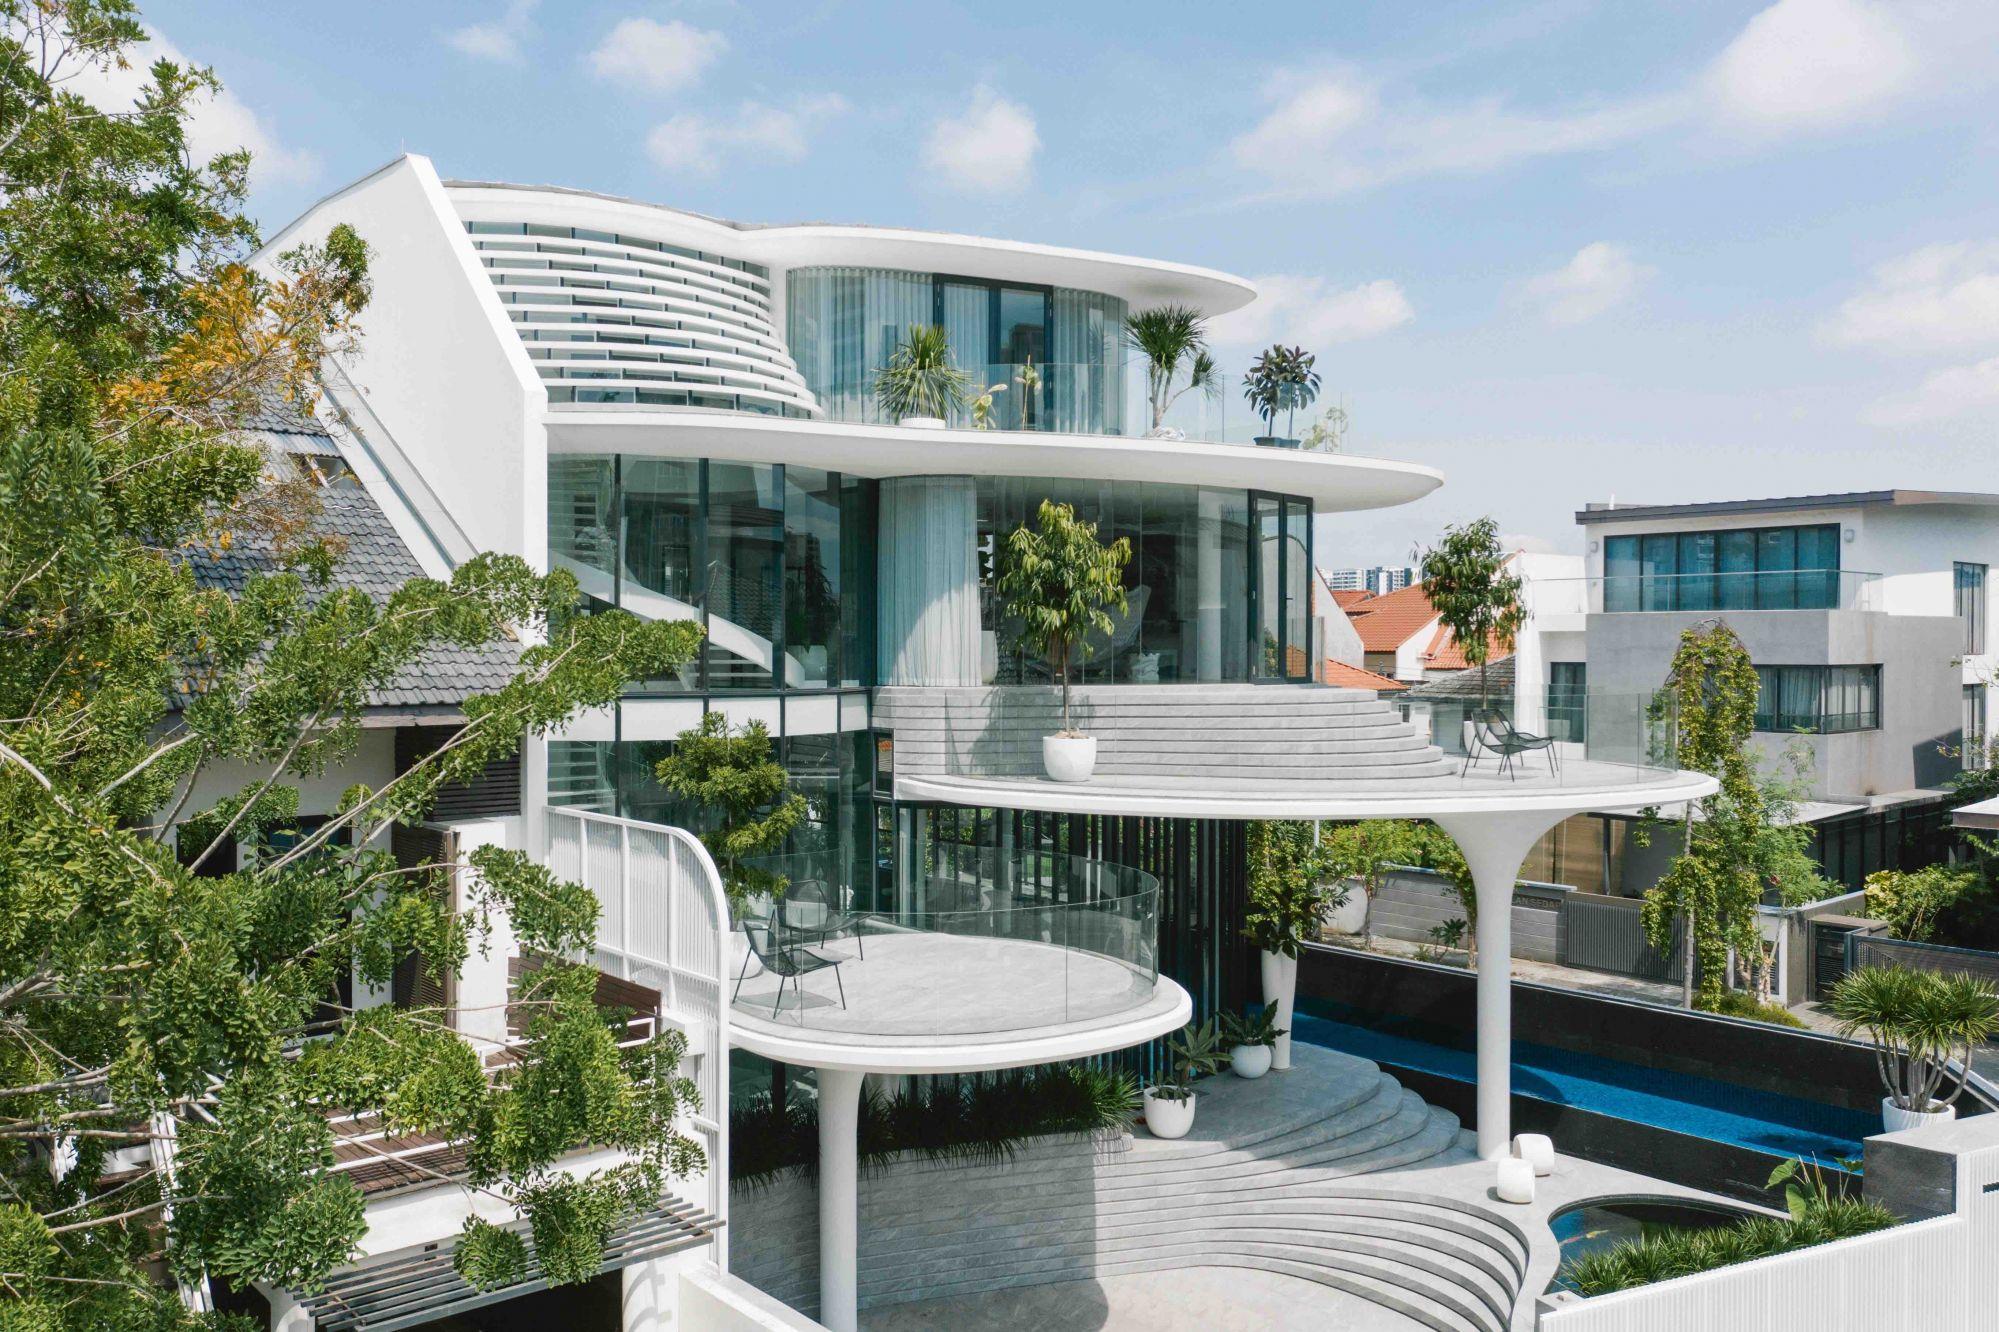 Home Tour: The Stiletto House In Singapore